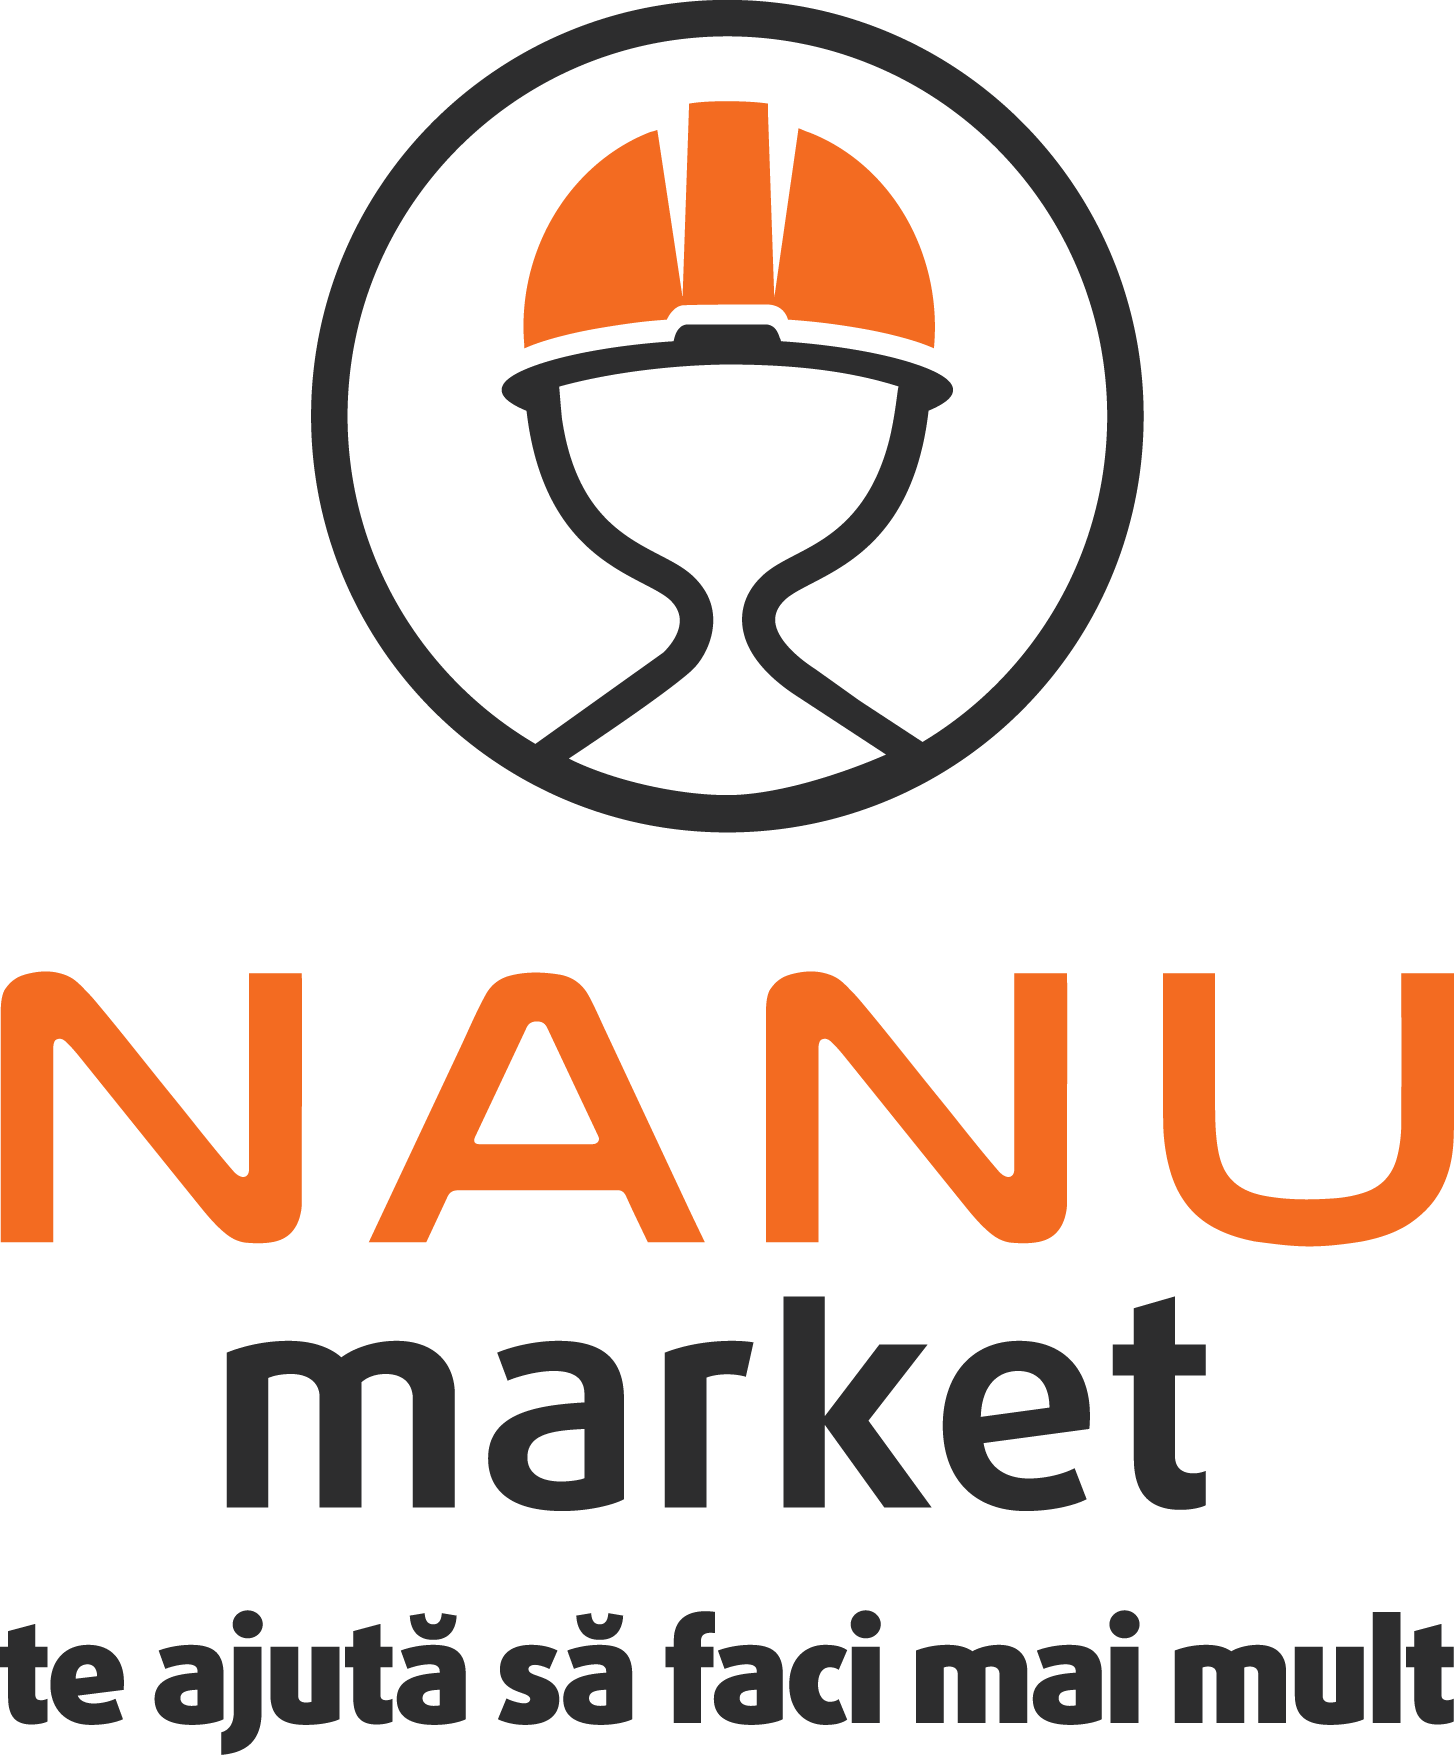 Nanu market te ajuta sa faci mai mult